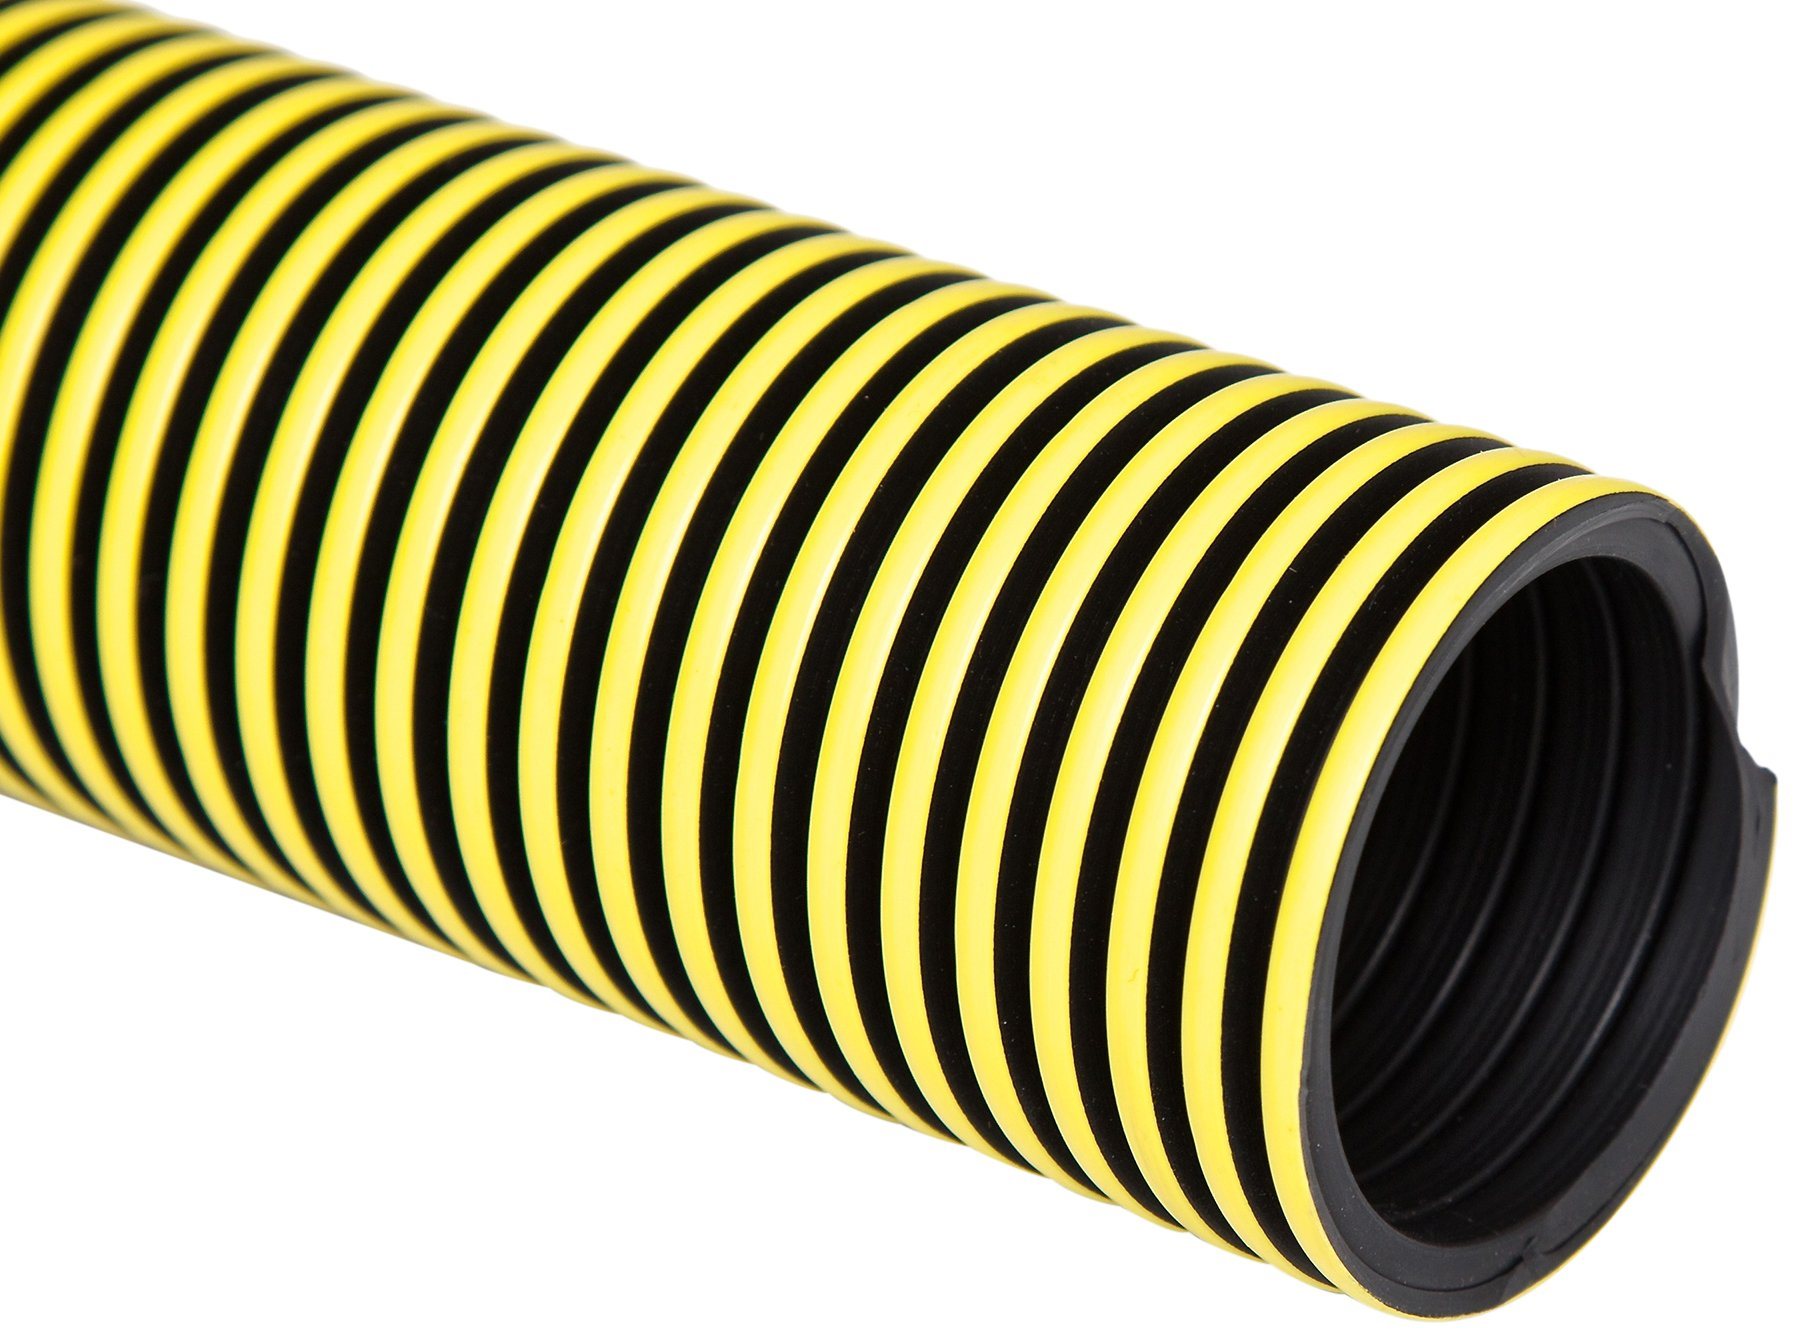 Flexaust 5991500200 Statpath Plus Polyethylene Flexible Hose, 18 psi, 25' Length, 1.5'' ID, Yellow